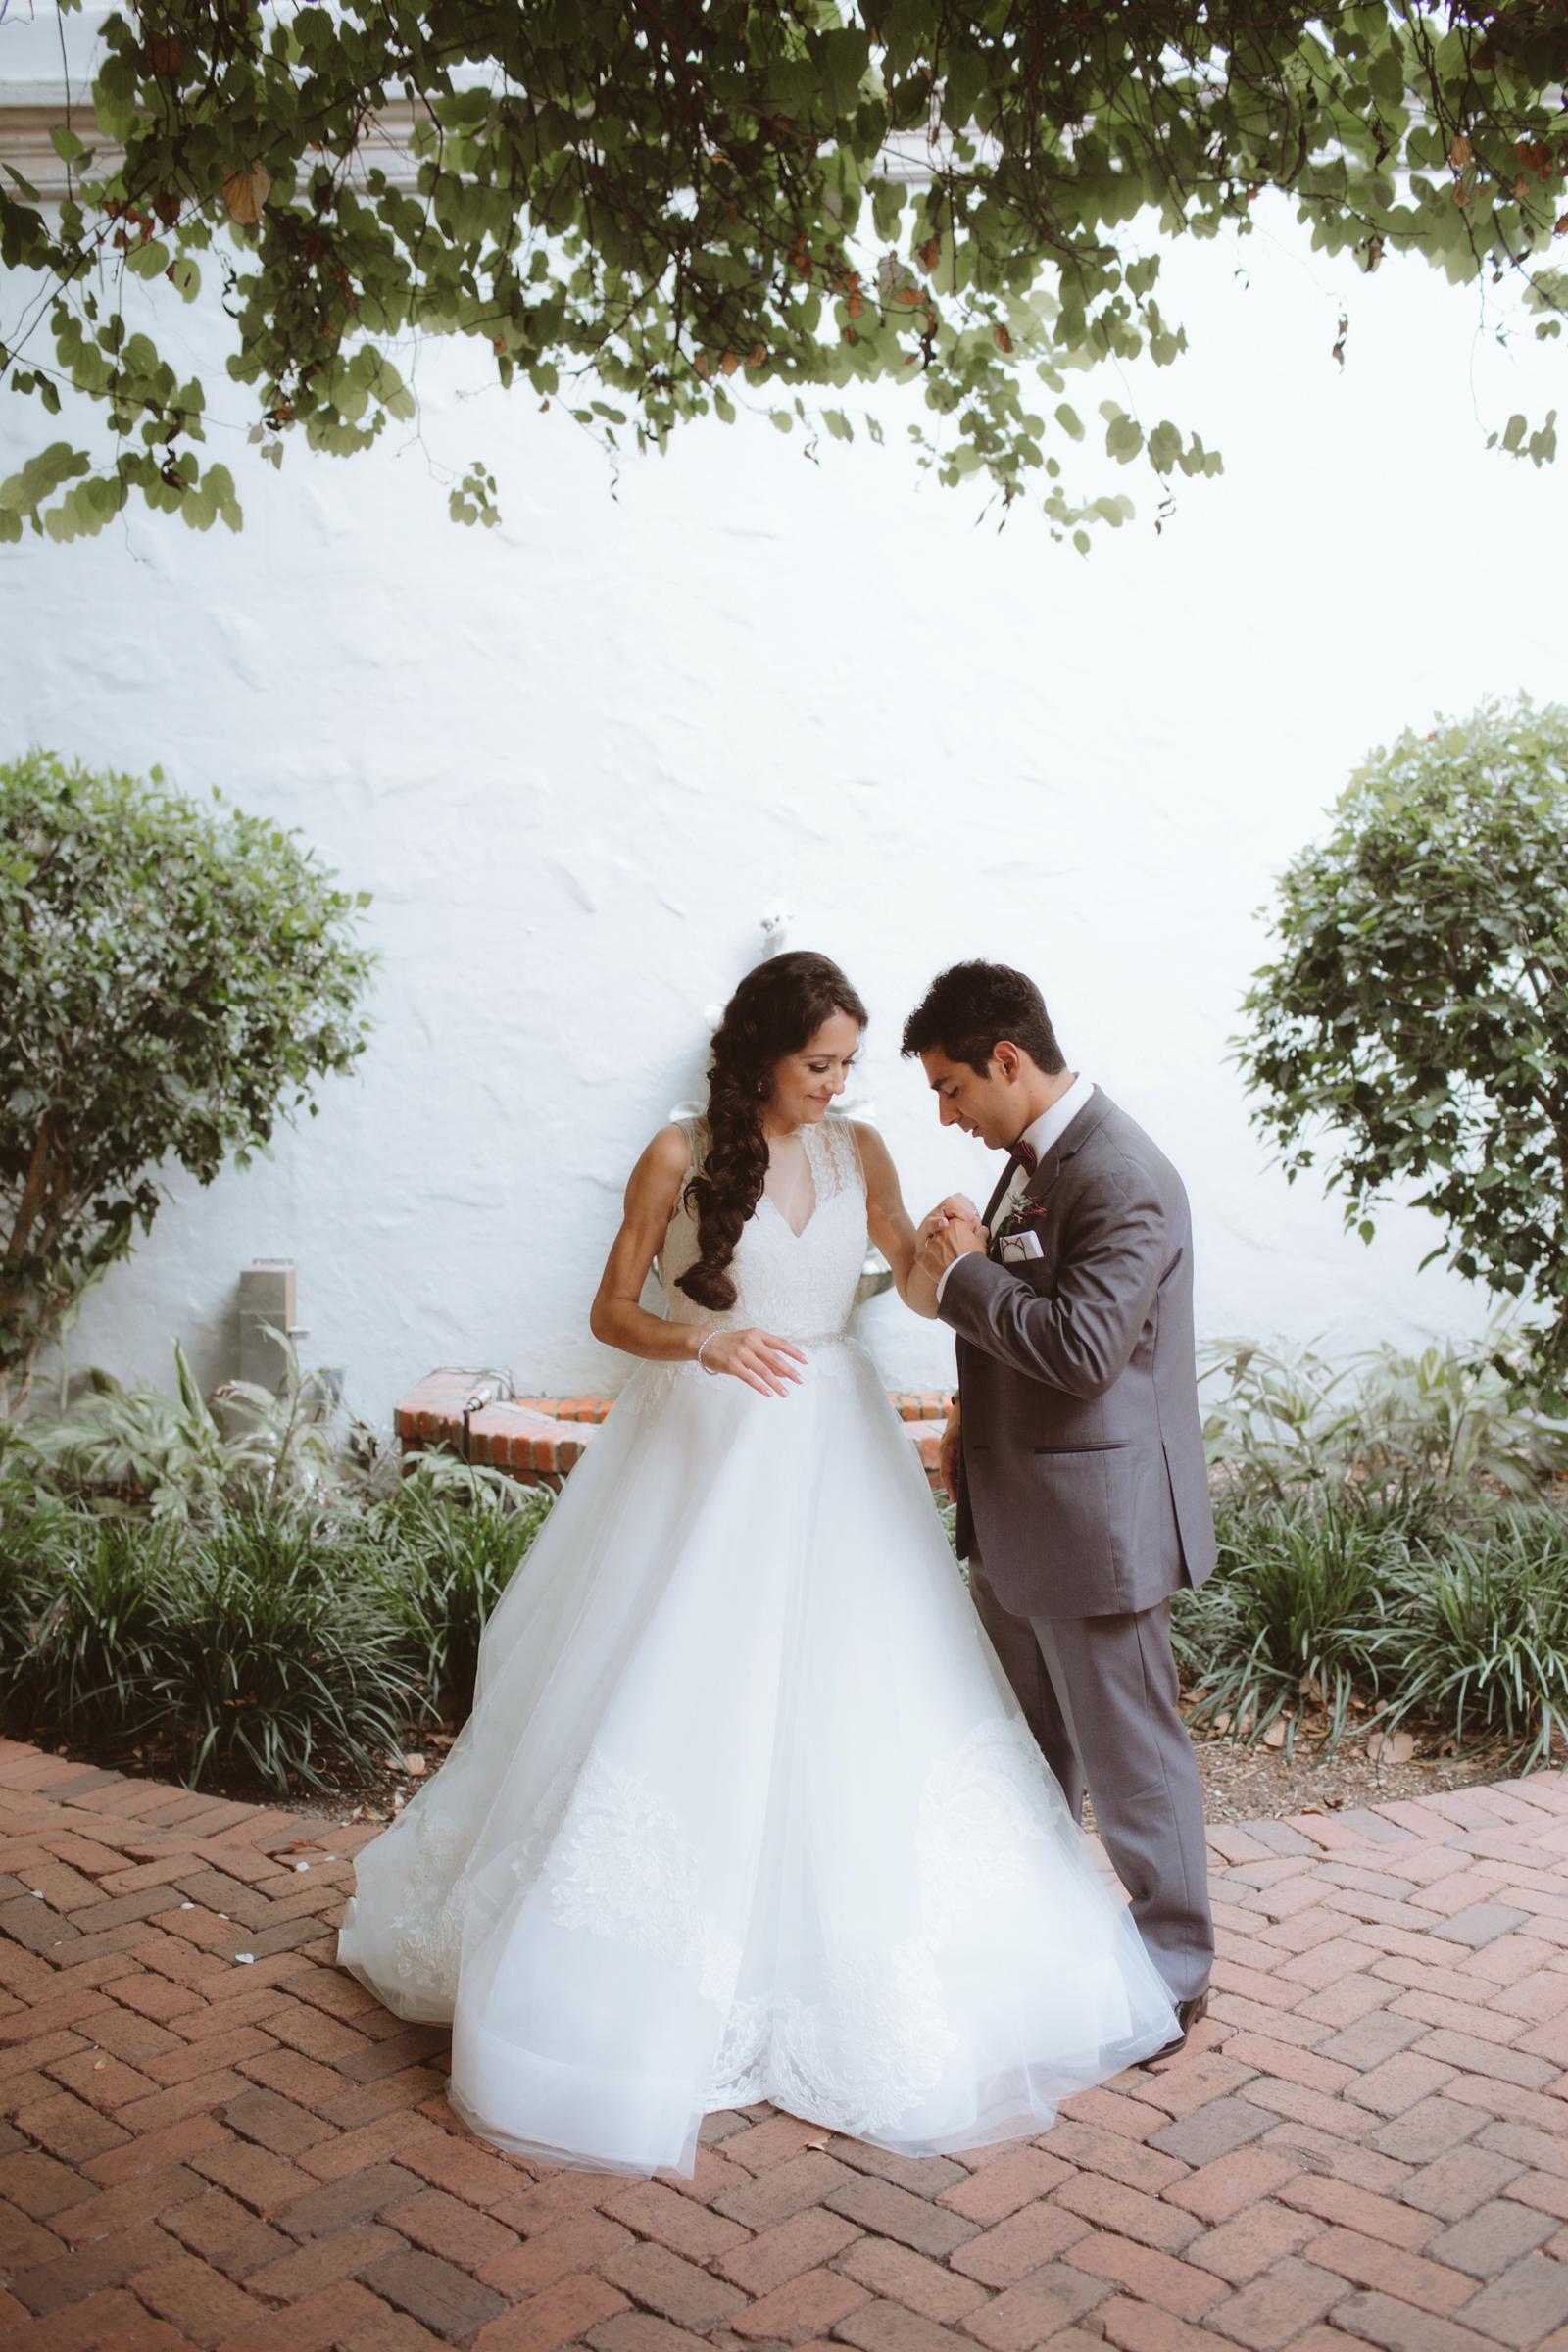 wedding day | MFA St Pete | Vanessa Boy Photography | vanessaboy.com-449.com |final.jpg